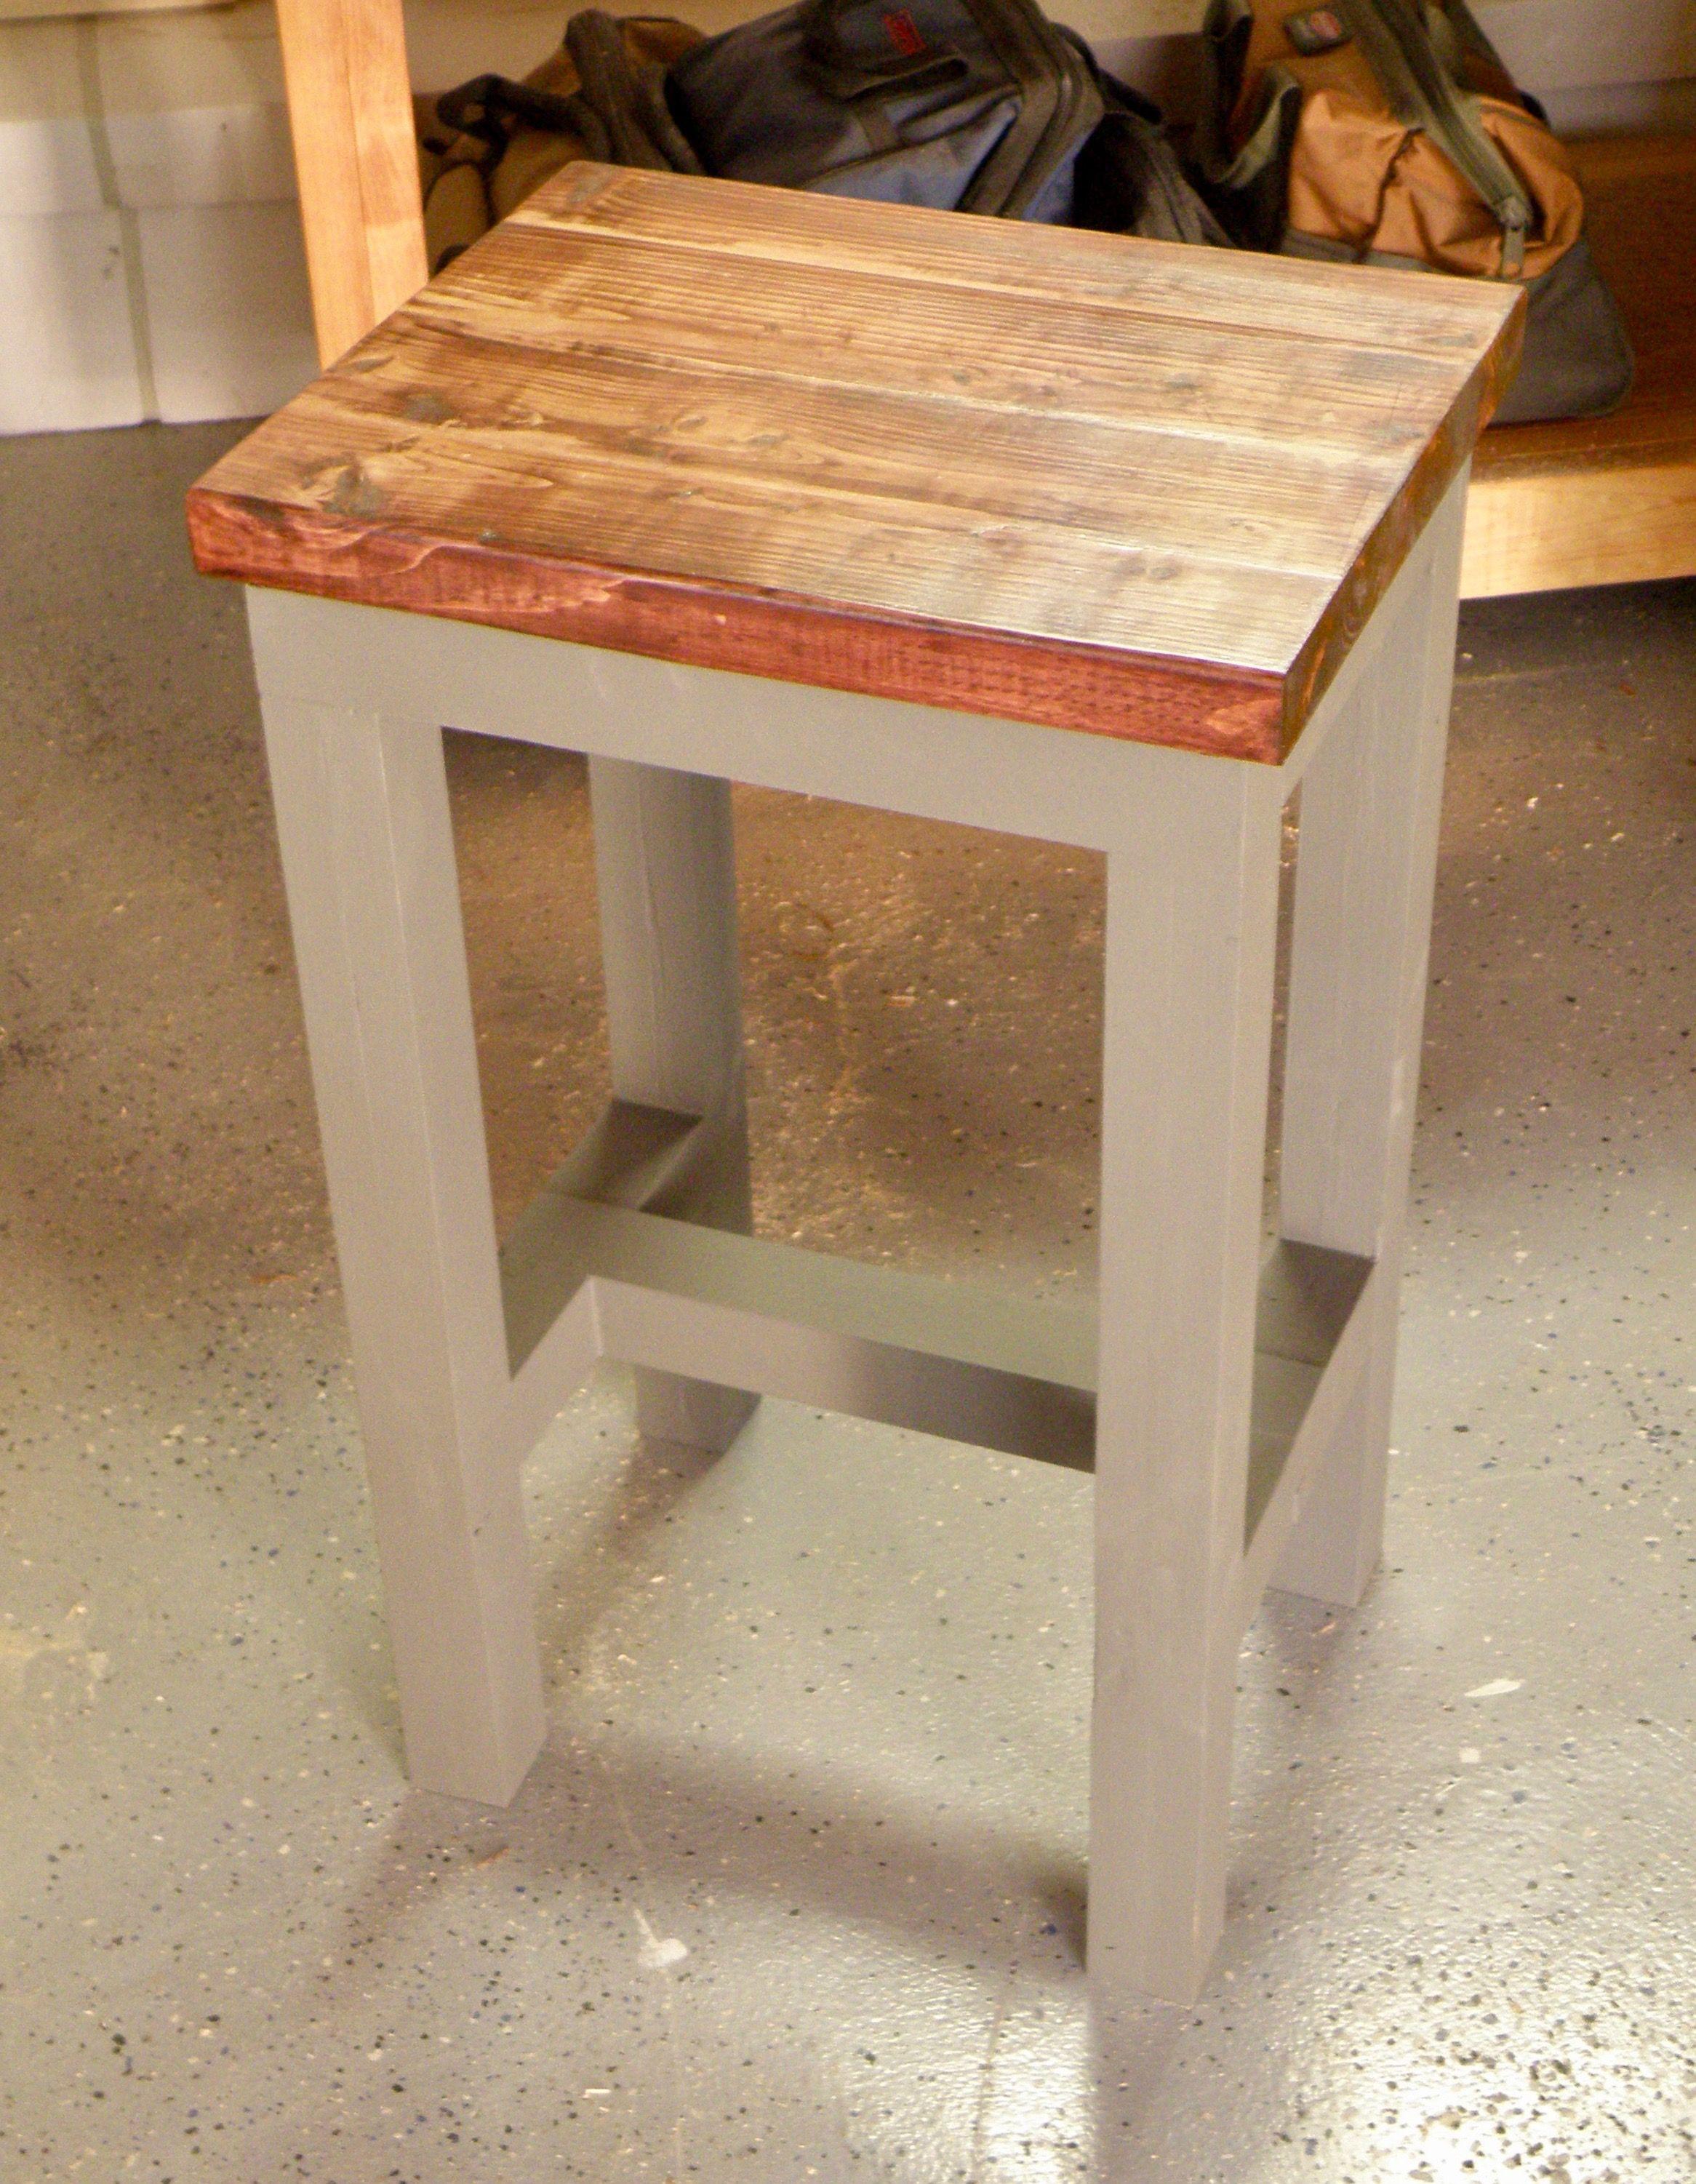 Super Workbench Stool Handmade From Douglas Fir Using Mortise Pdpeps Interior Chair Design Pdpepsorg